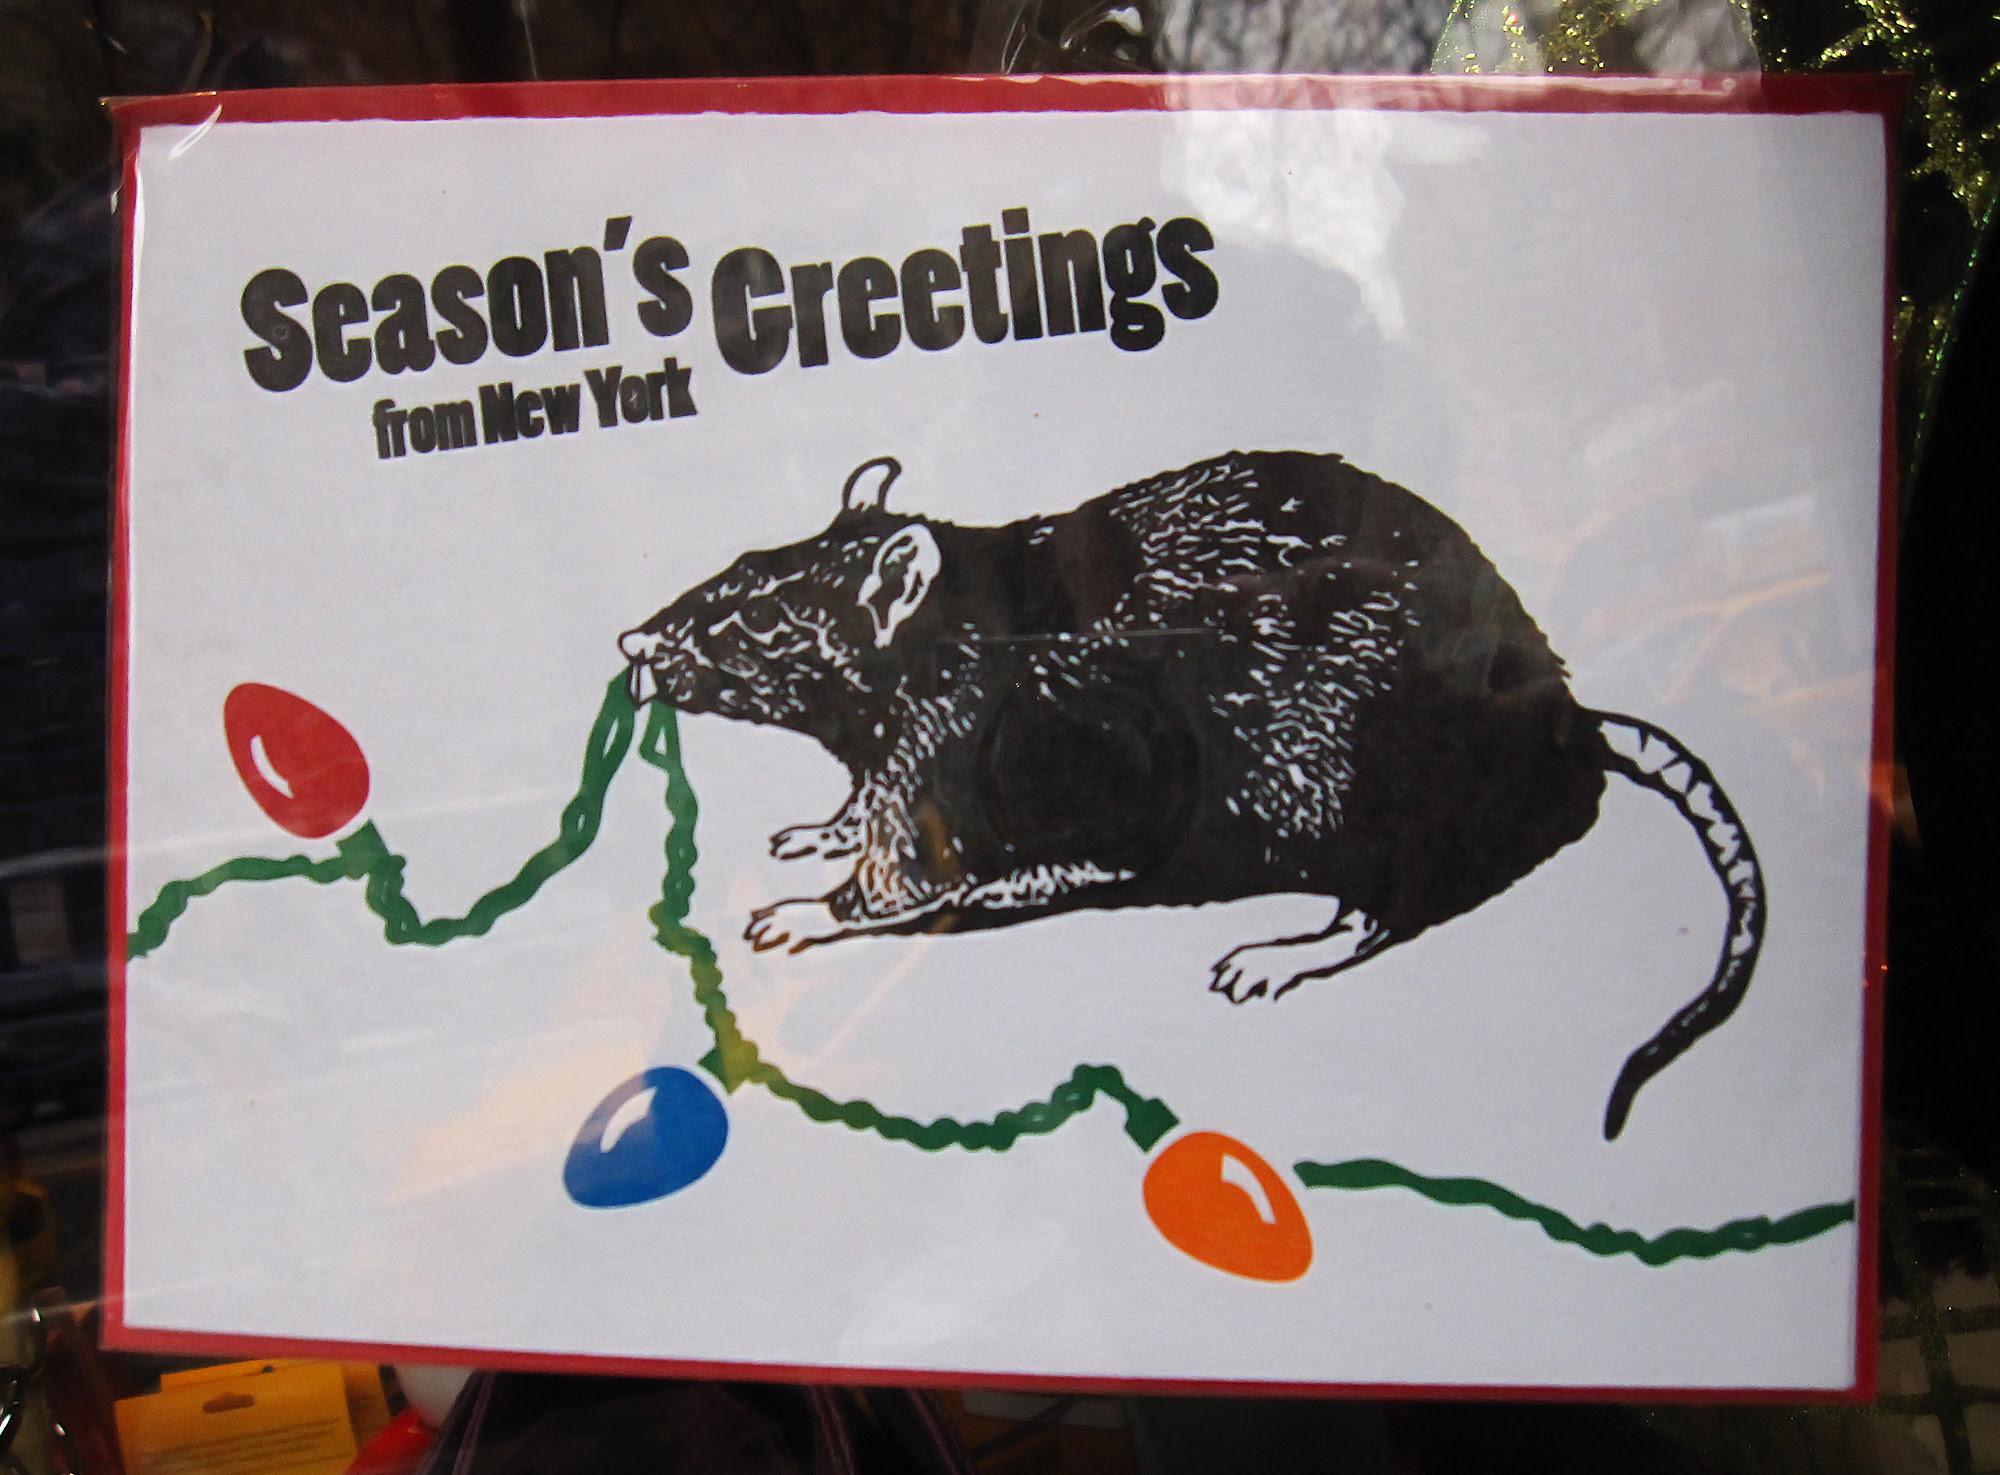 Season's Greetings from New York